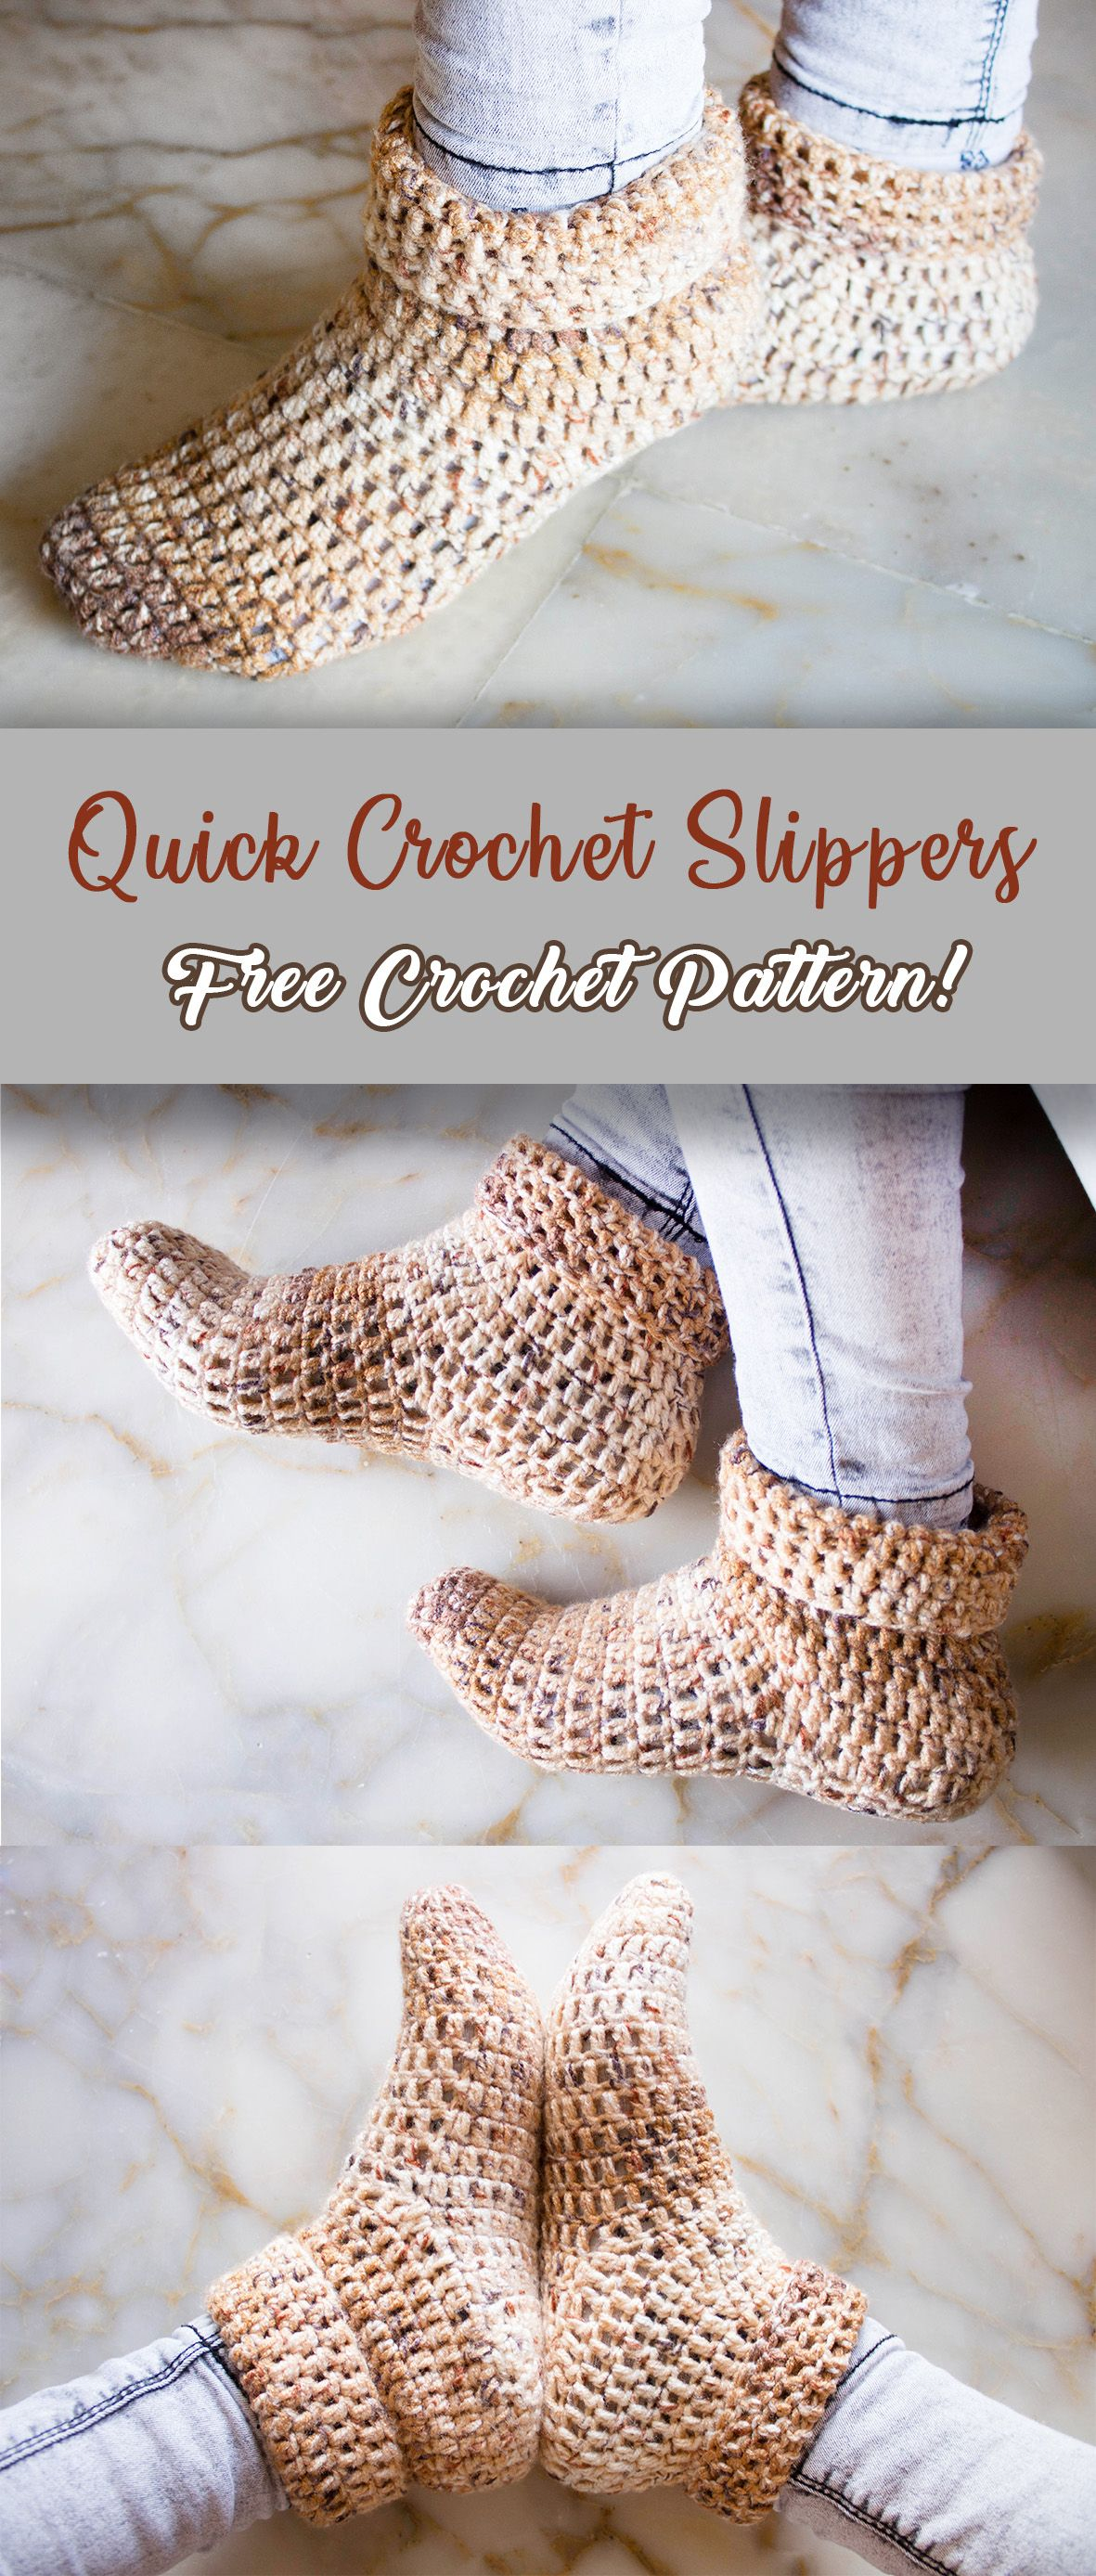 FREE CROCHET PATTERN! Quick Crochet Slippers... Click to go to the pattern. #slippers #socks #crochet #freepattern